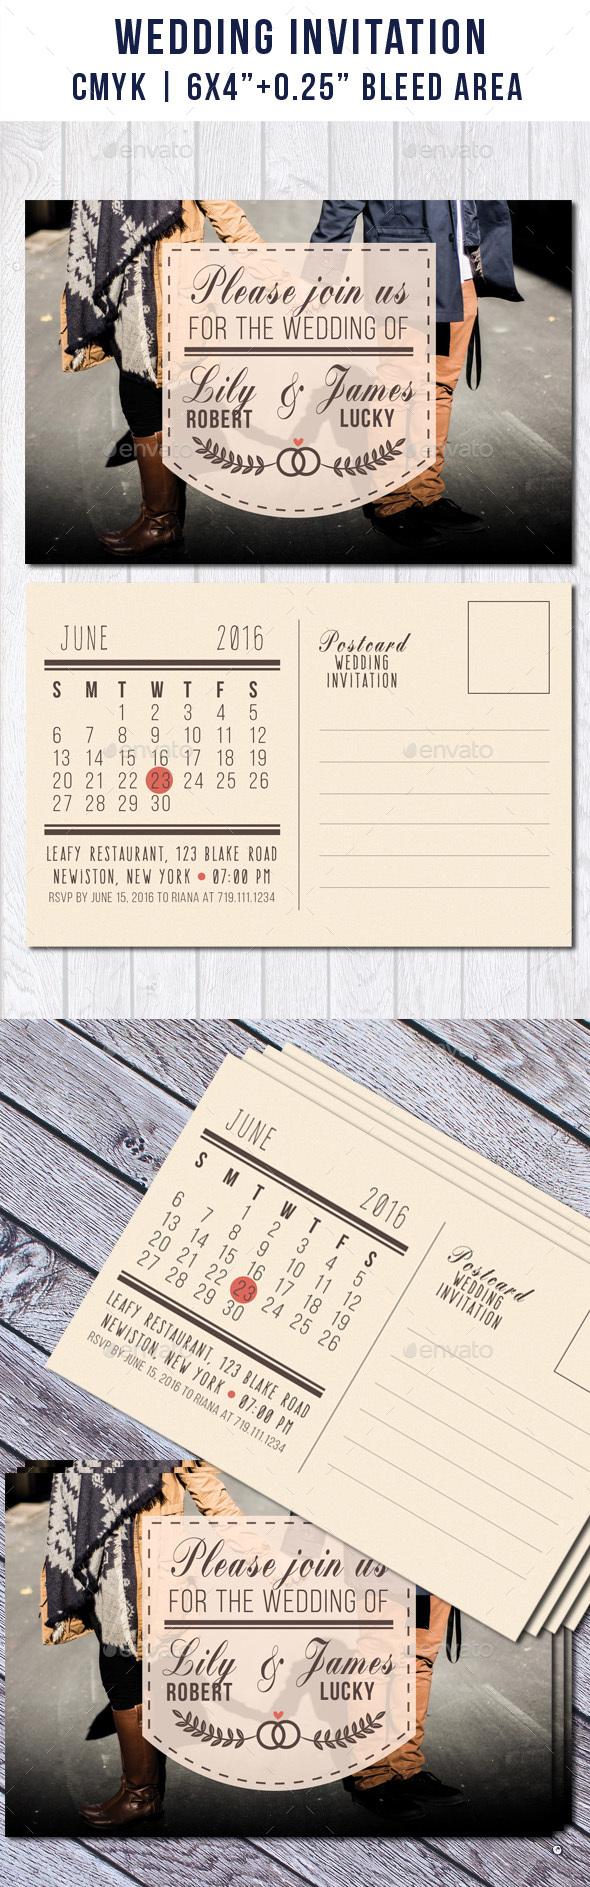 Wedding Postcard Invitation with Calendar